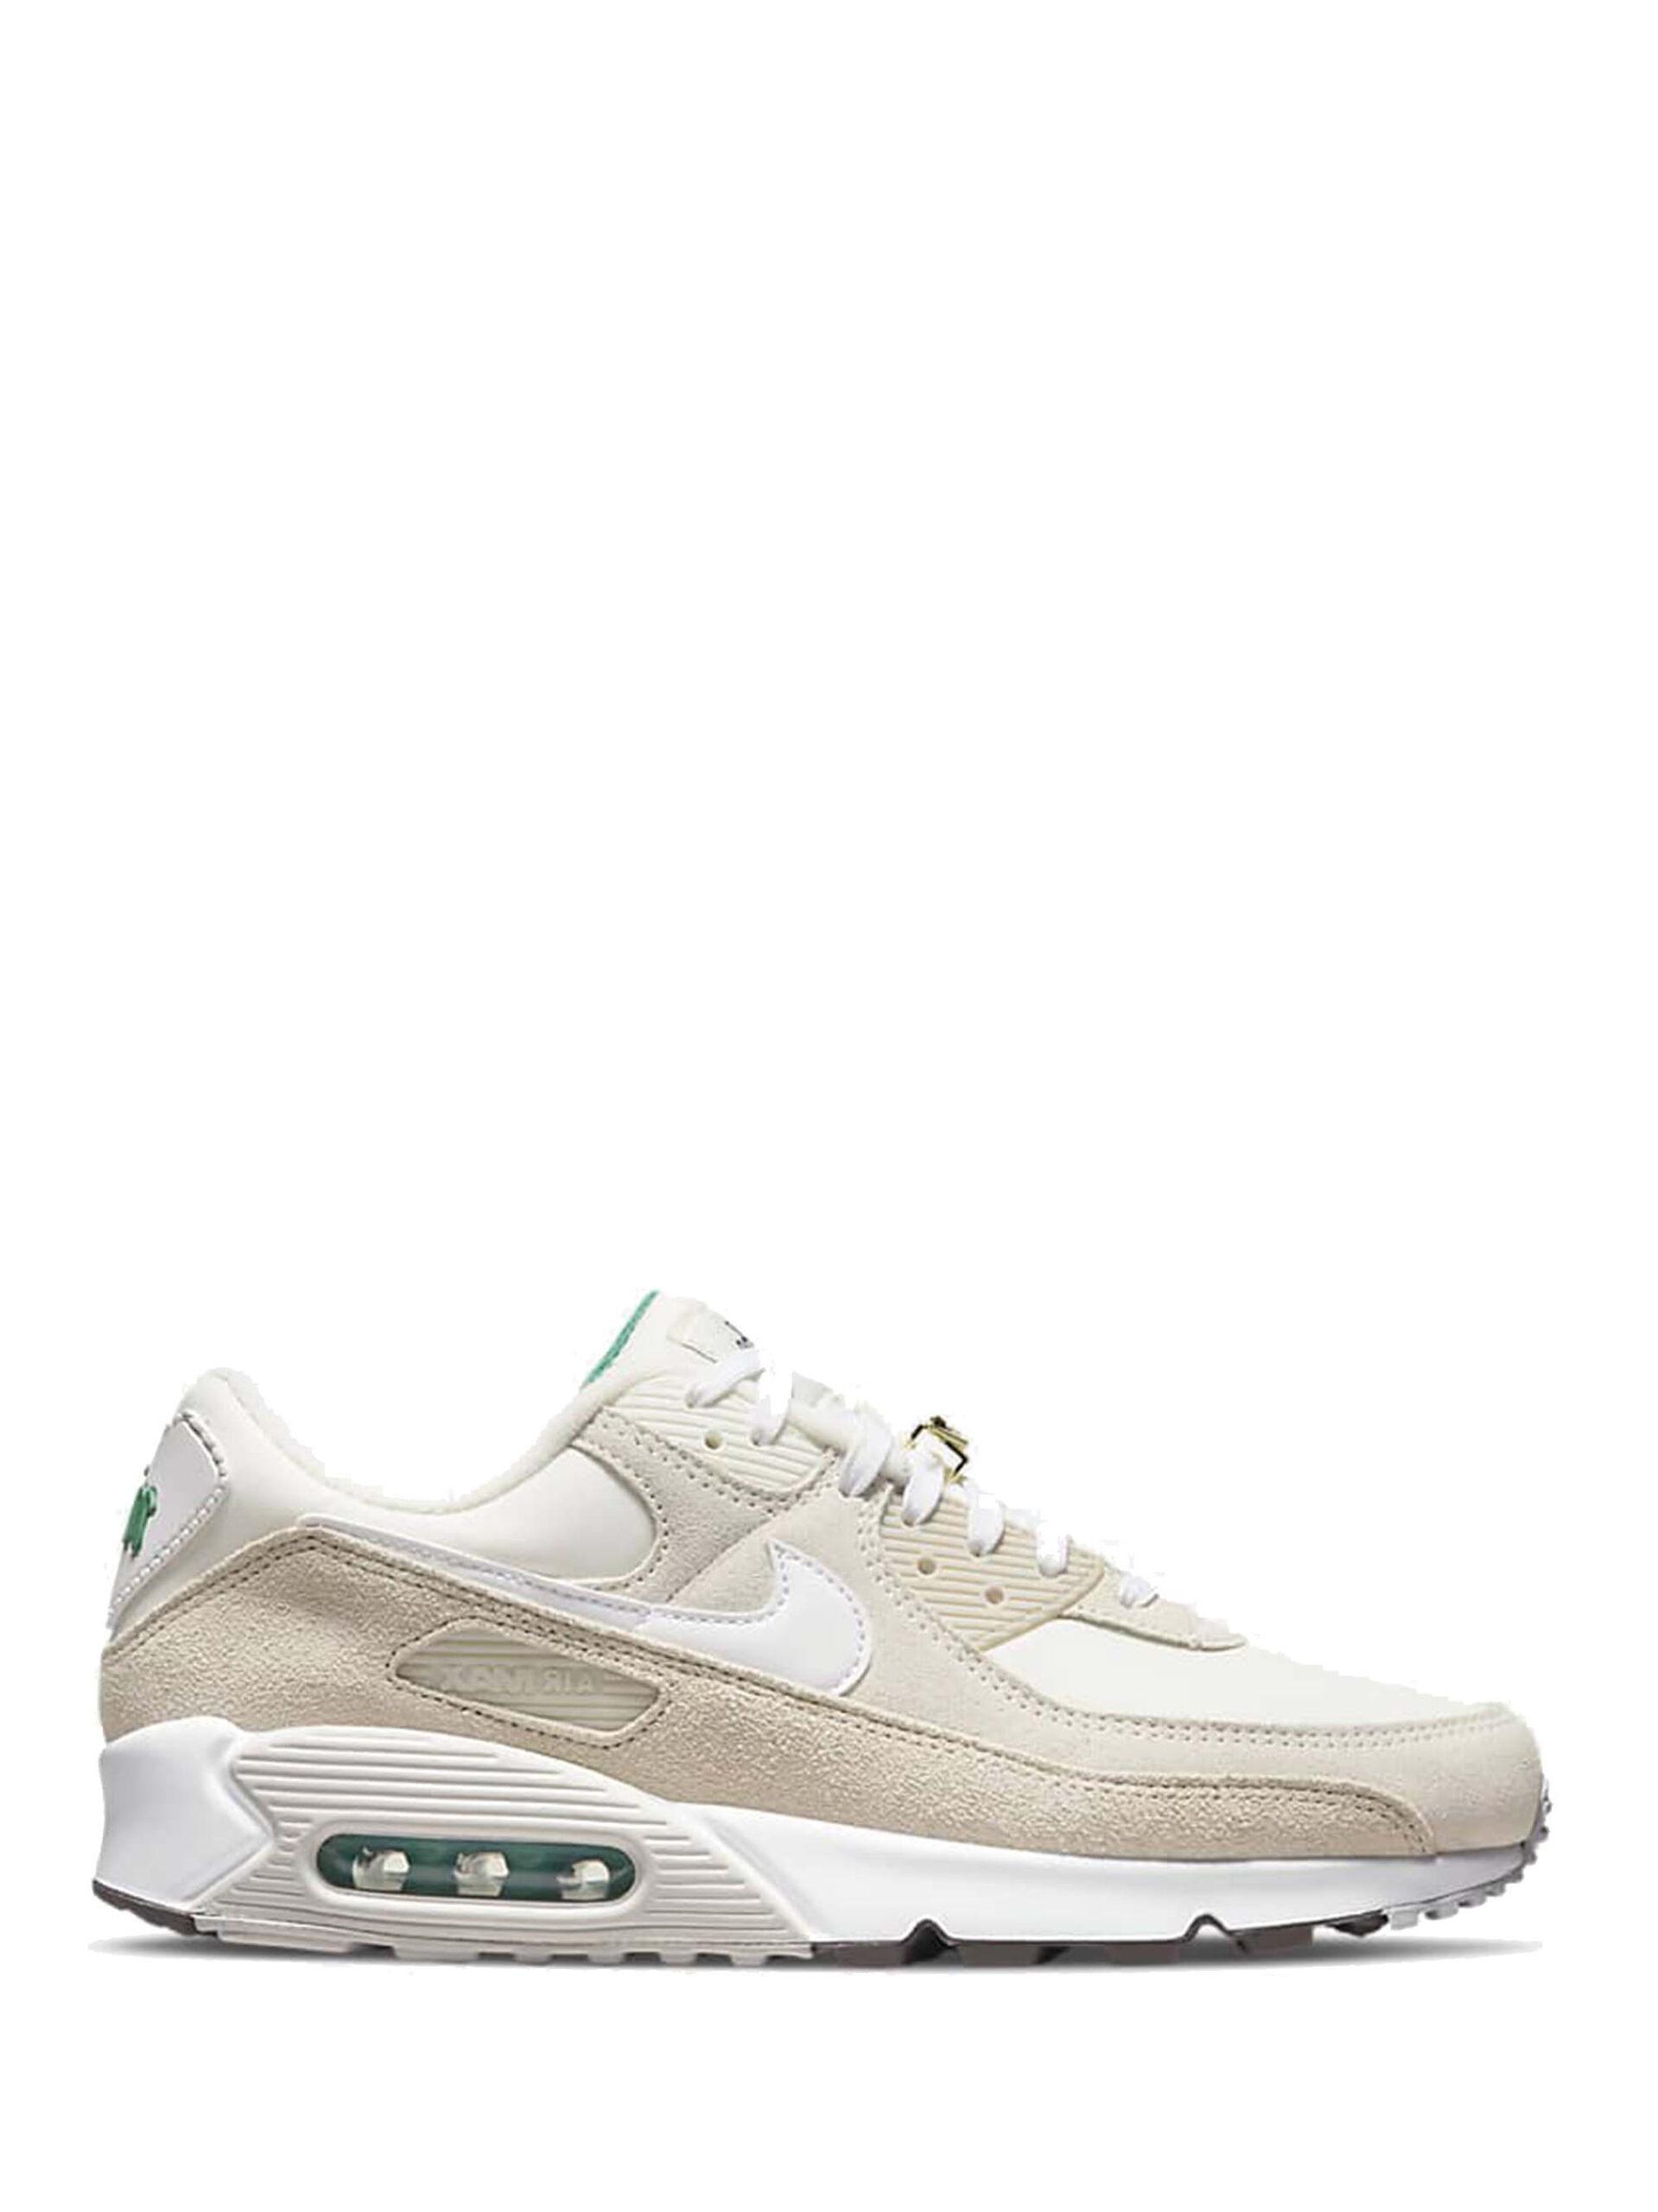 <p class='small-title'>NIKE</p>Nike Air Max 90 SE